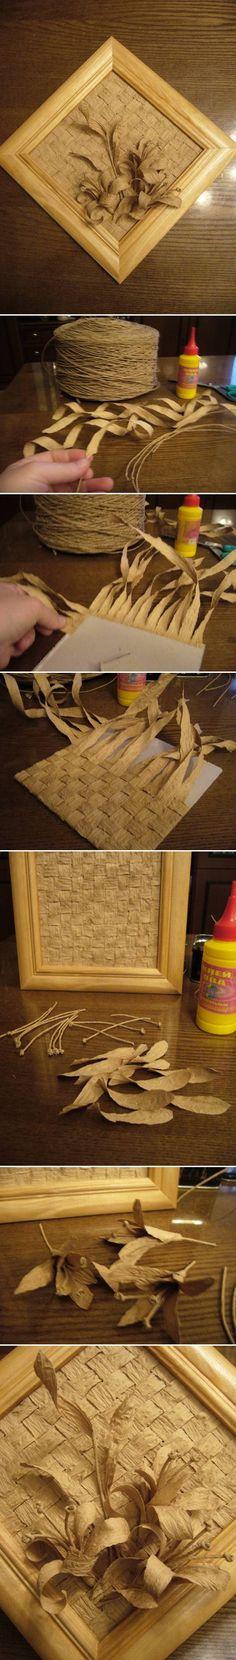 DIY Paper Twine Panel DIY Projects | UsefulDIY.com Follow Us on Facebook ==> http://www.facebook.com/UsefulDiy